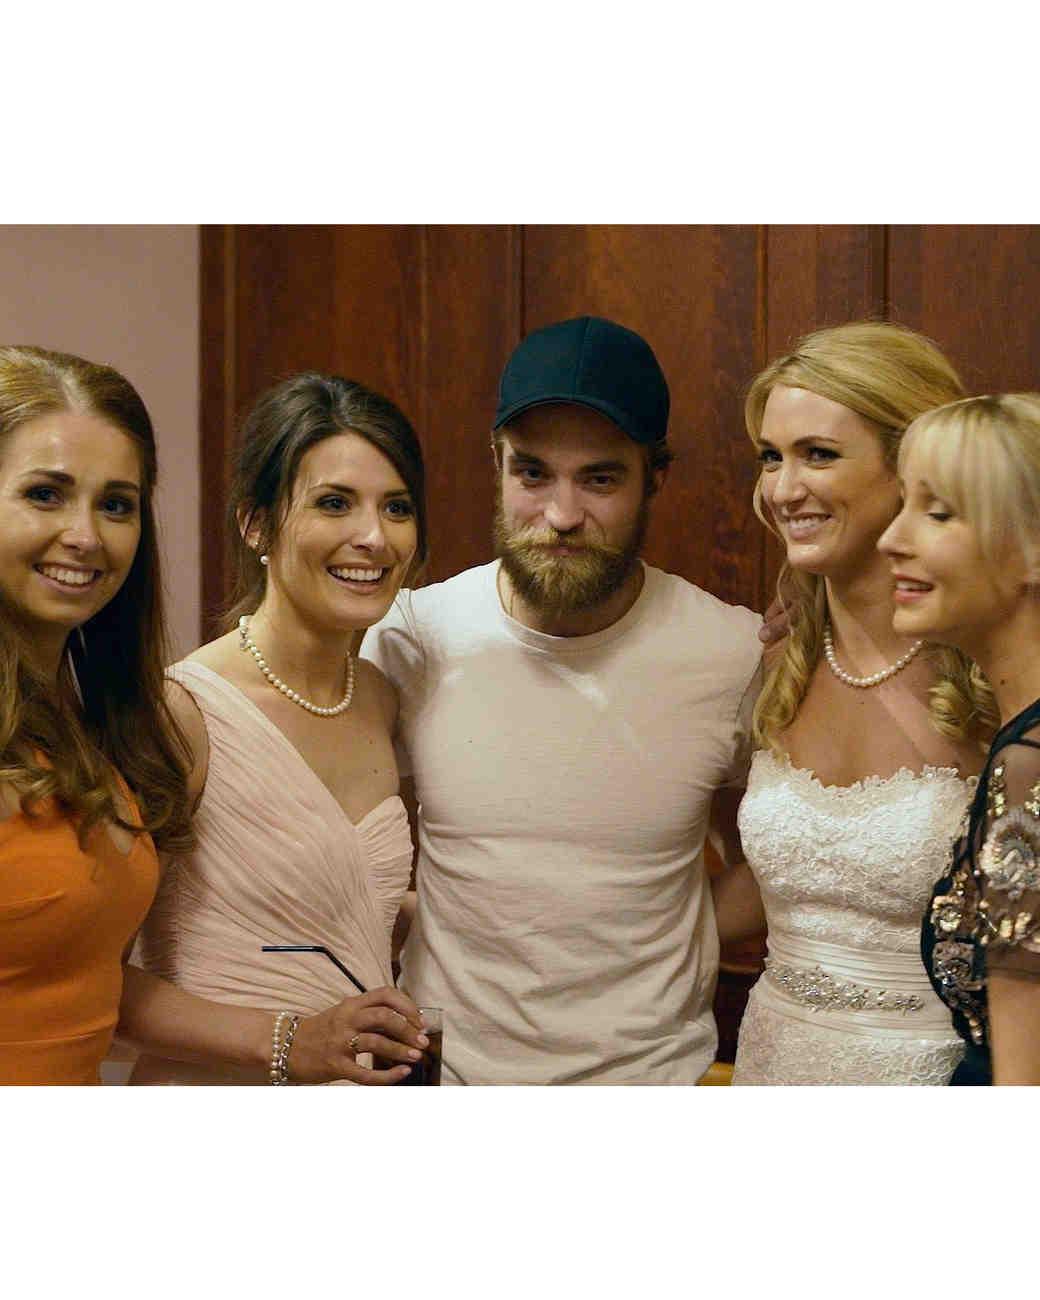 celebrity-wedding-crashers-robert-pattinson-1215.jpg